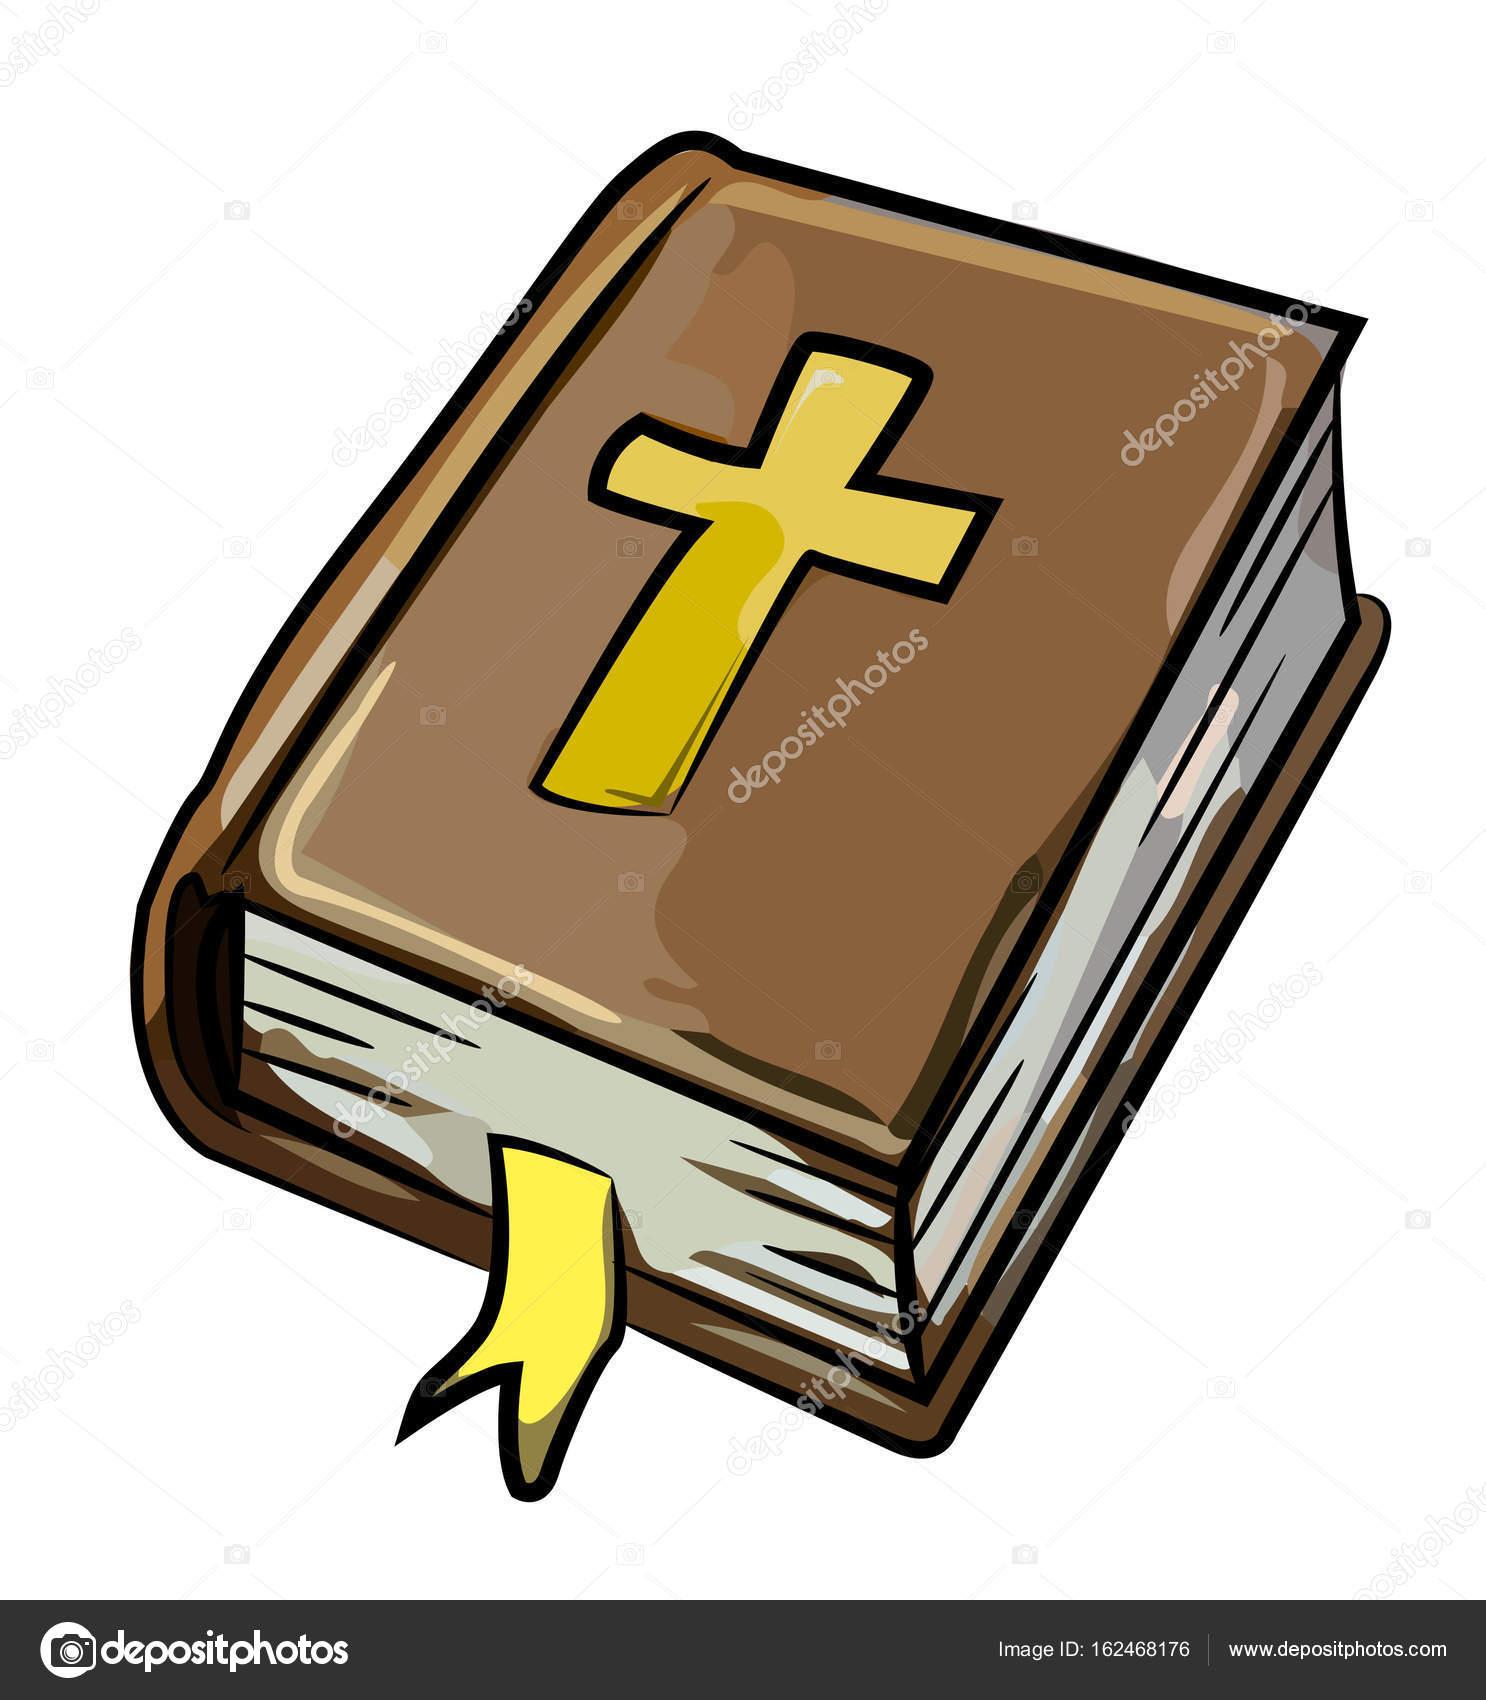 depositphotos_162468176-stock-illustration-cartoon-image-of-bible-icon.jpg